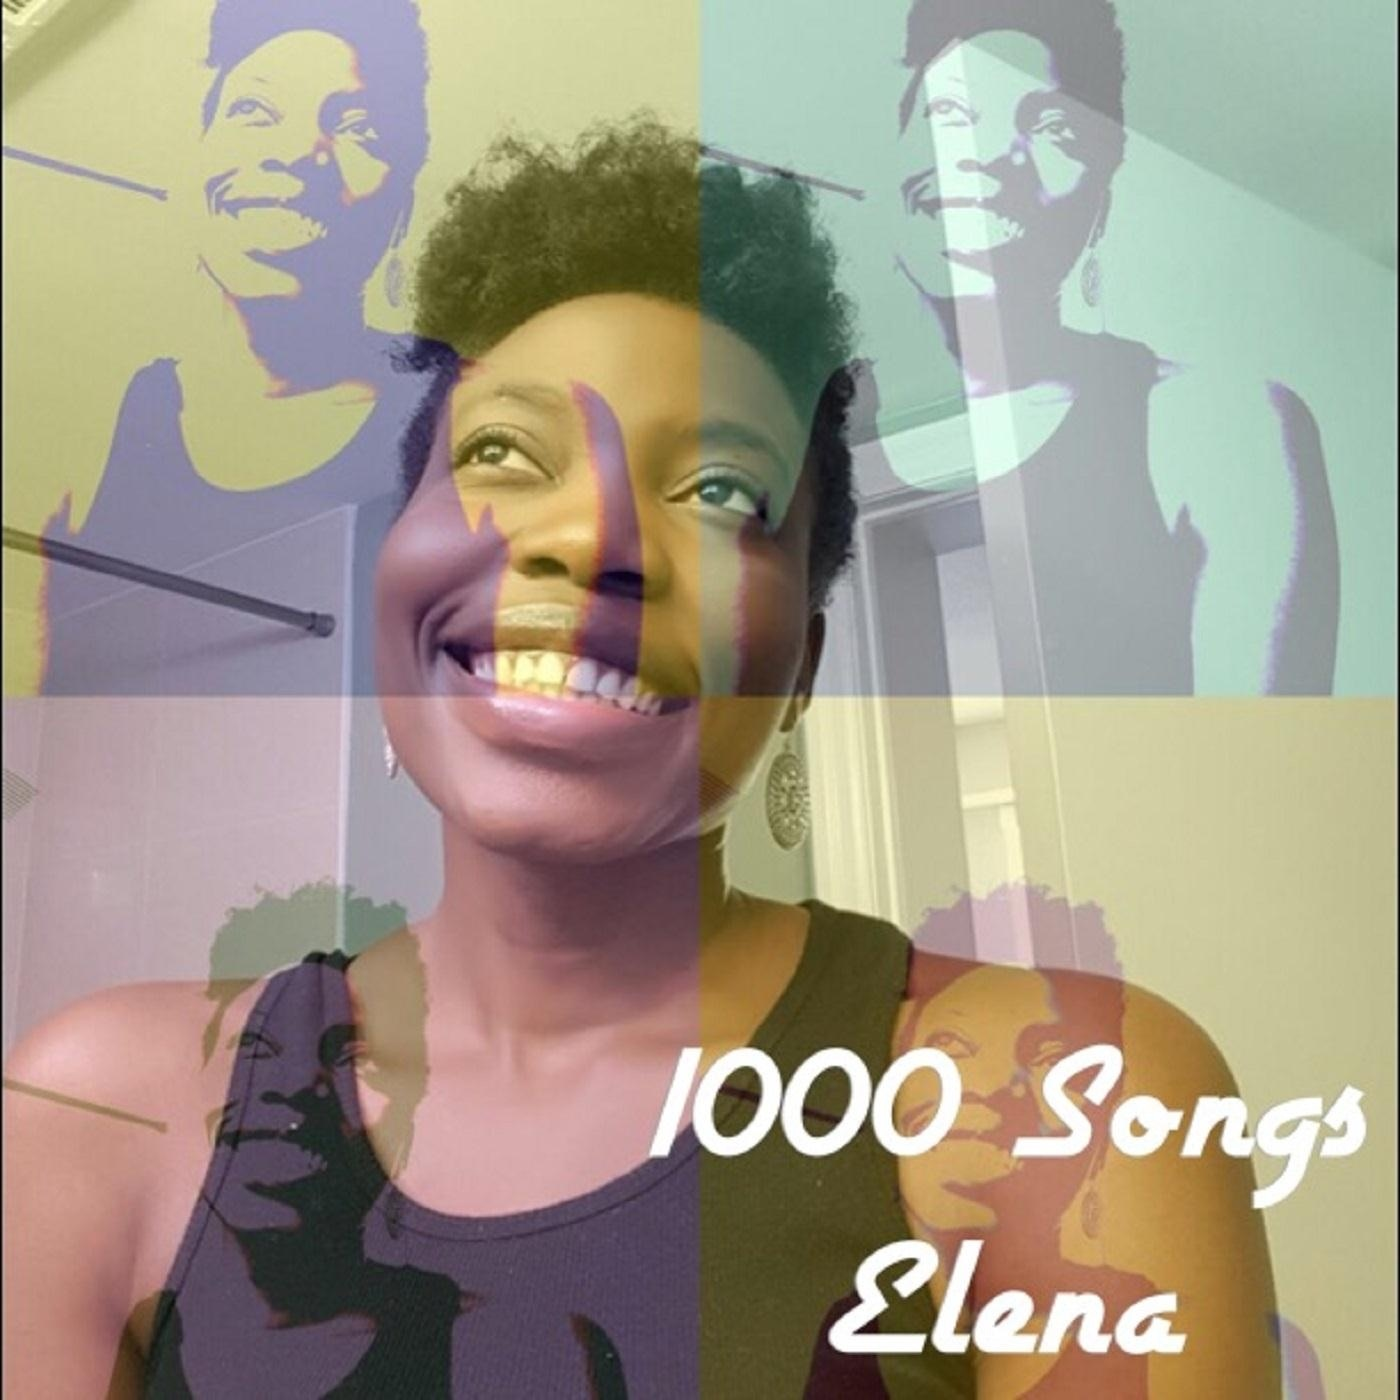 1000 Songs - Single